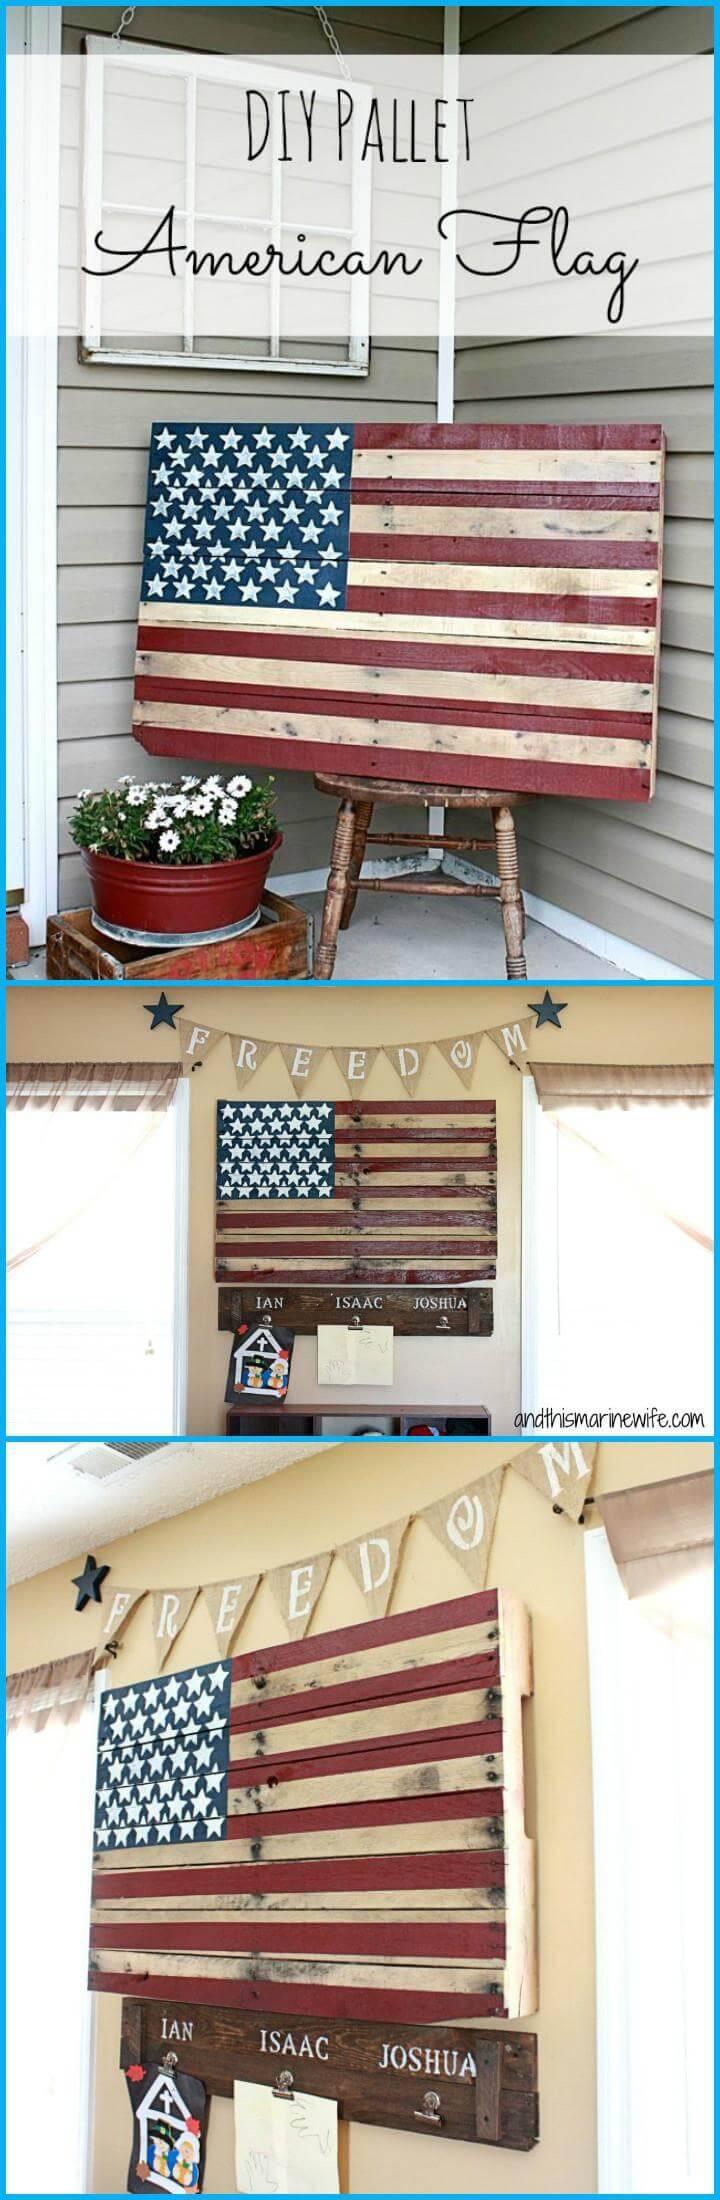 DIY beautiful pallet American flag